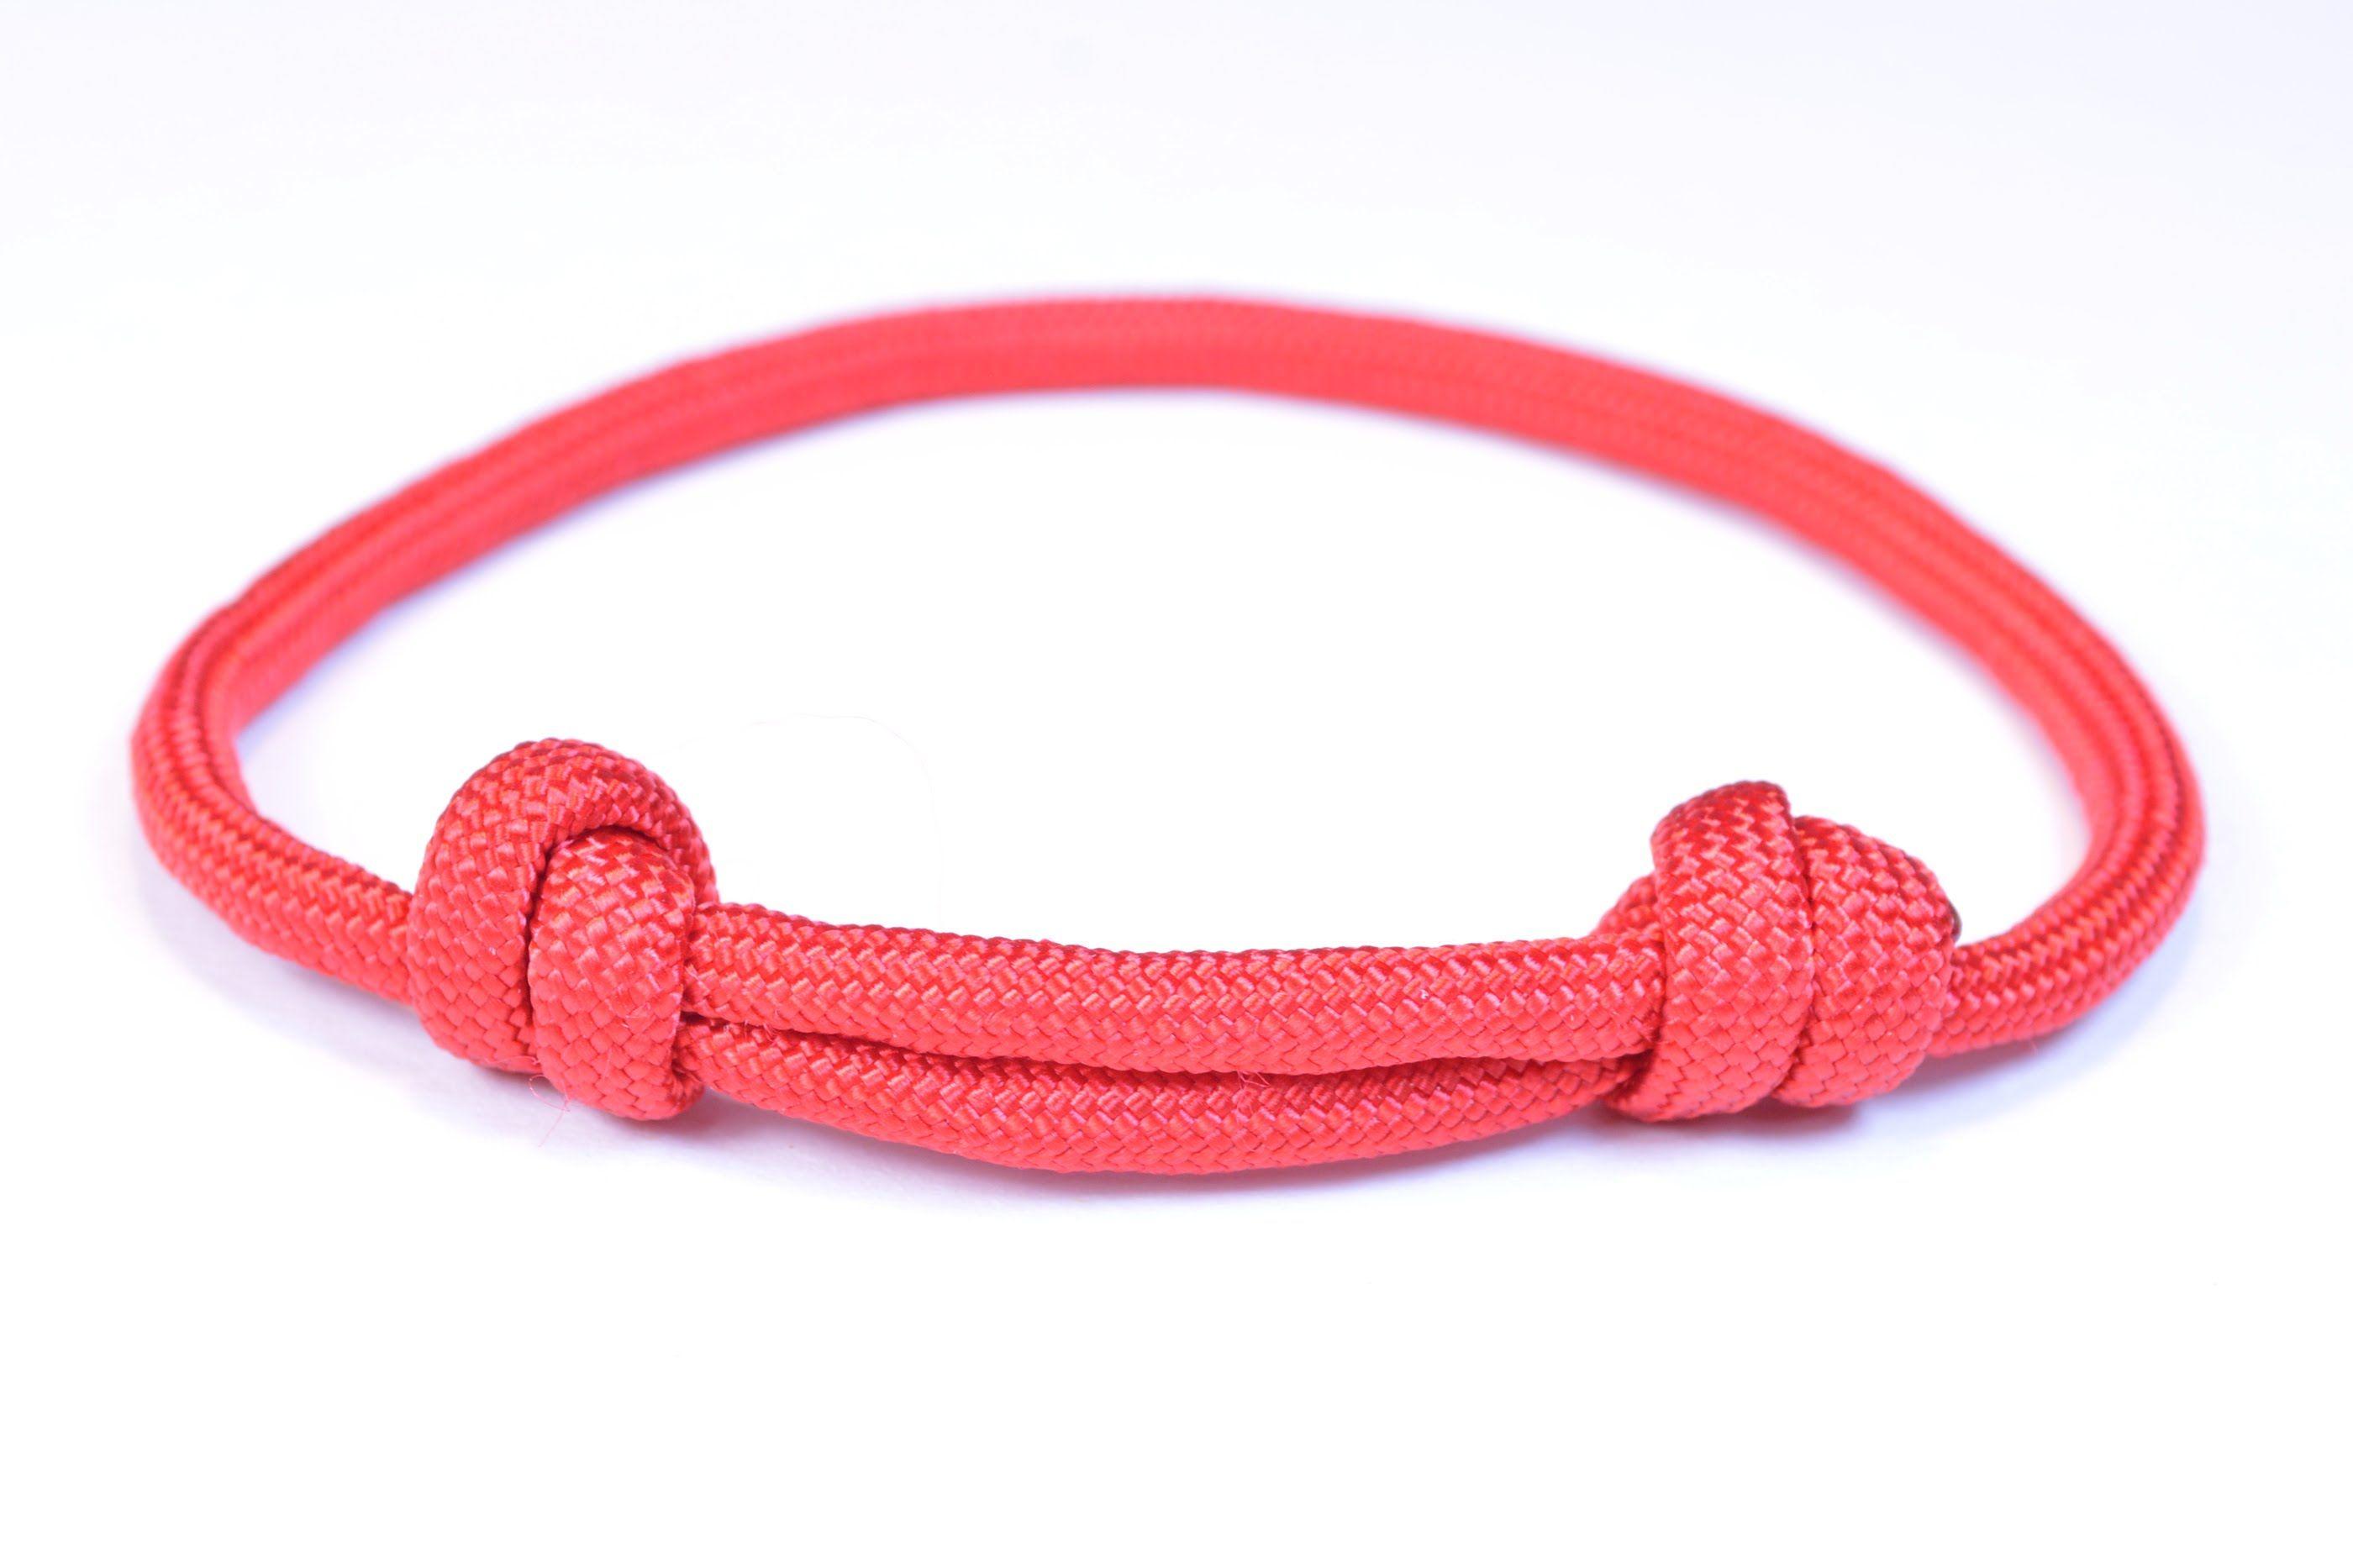 Make The Sliding Knot Friendship Paracord Bracelet Bored